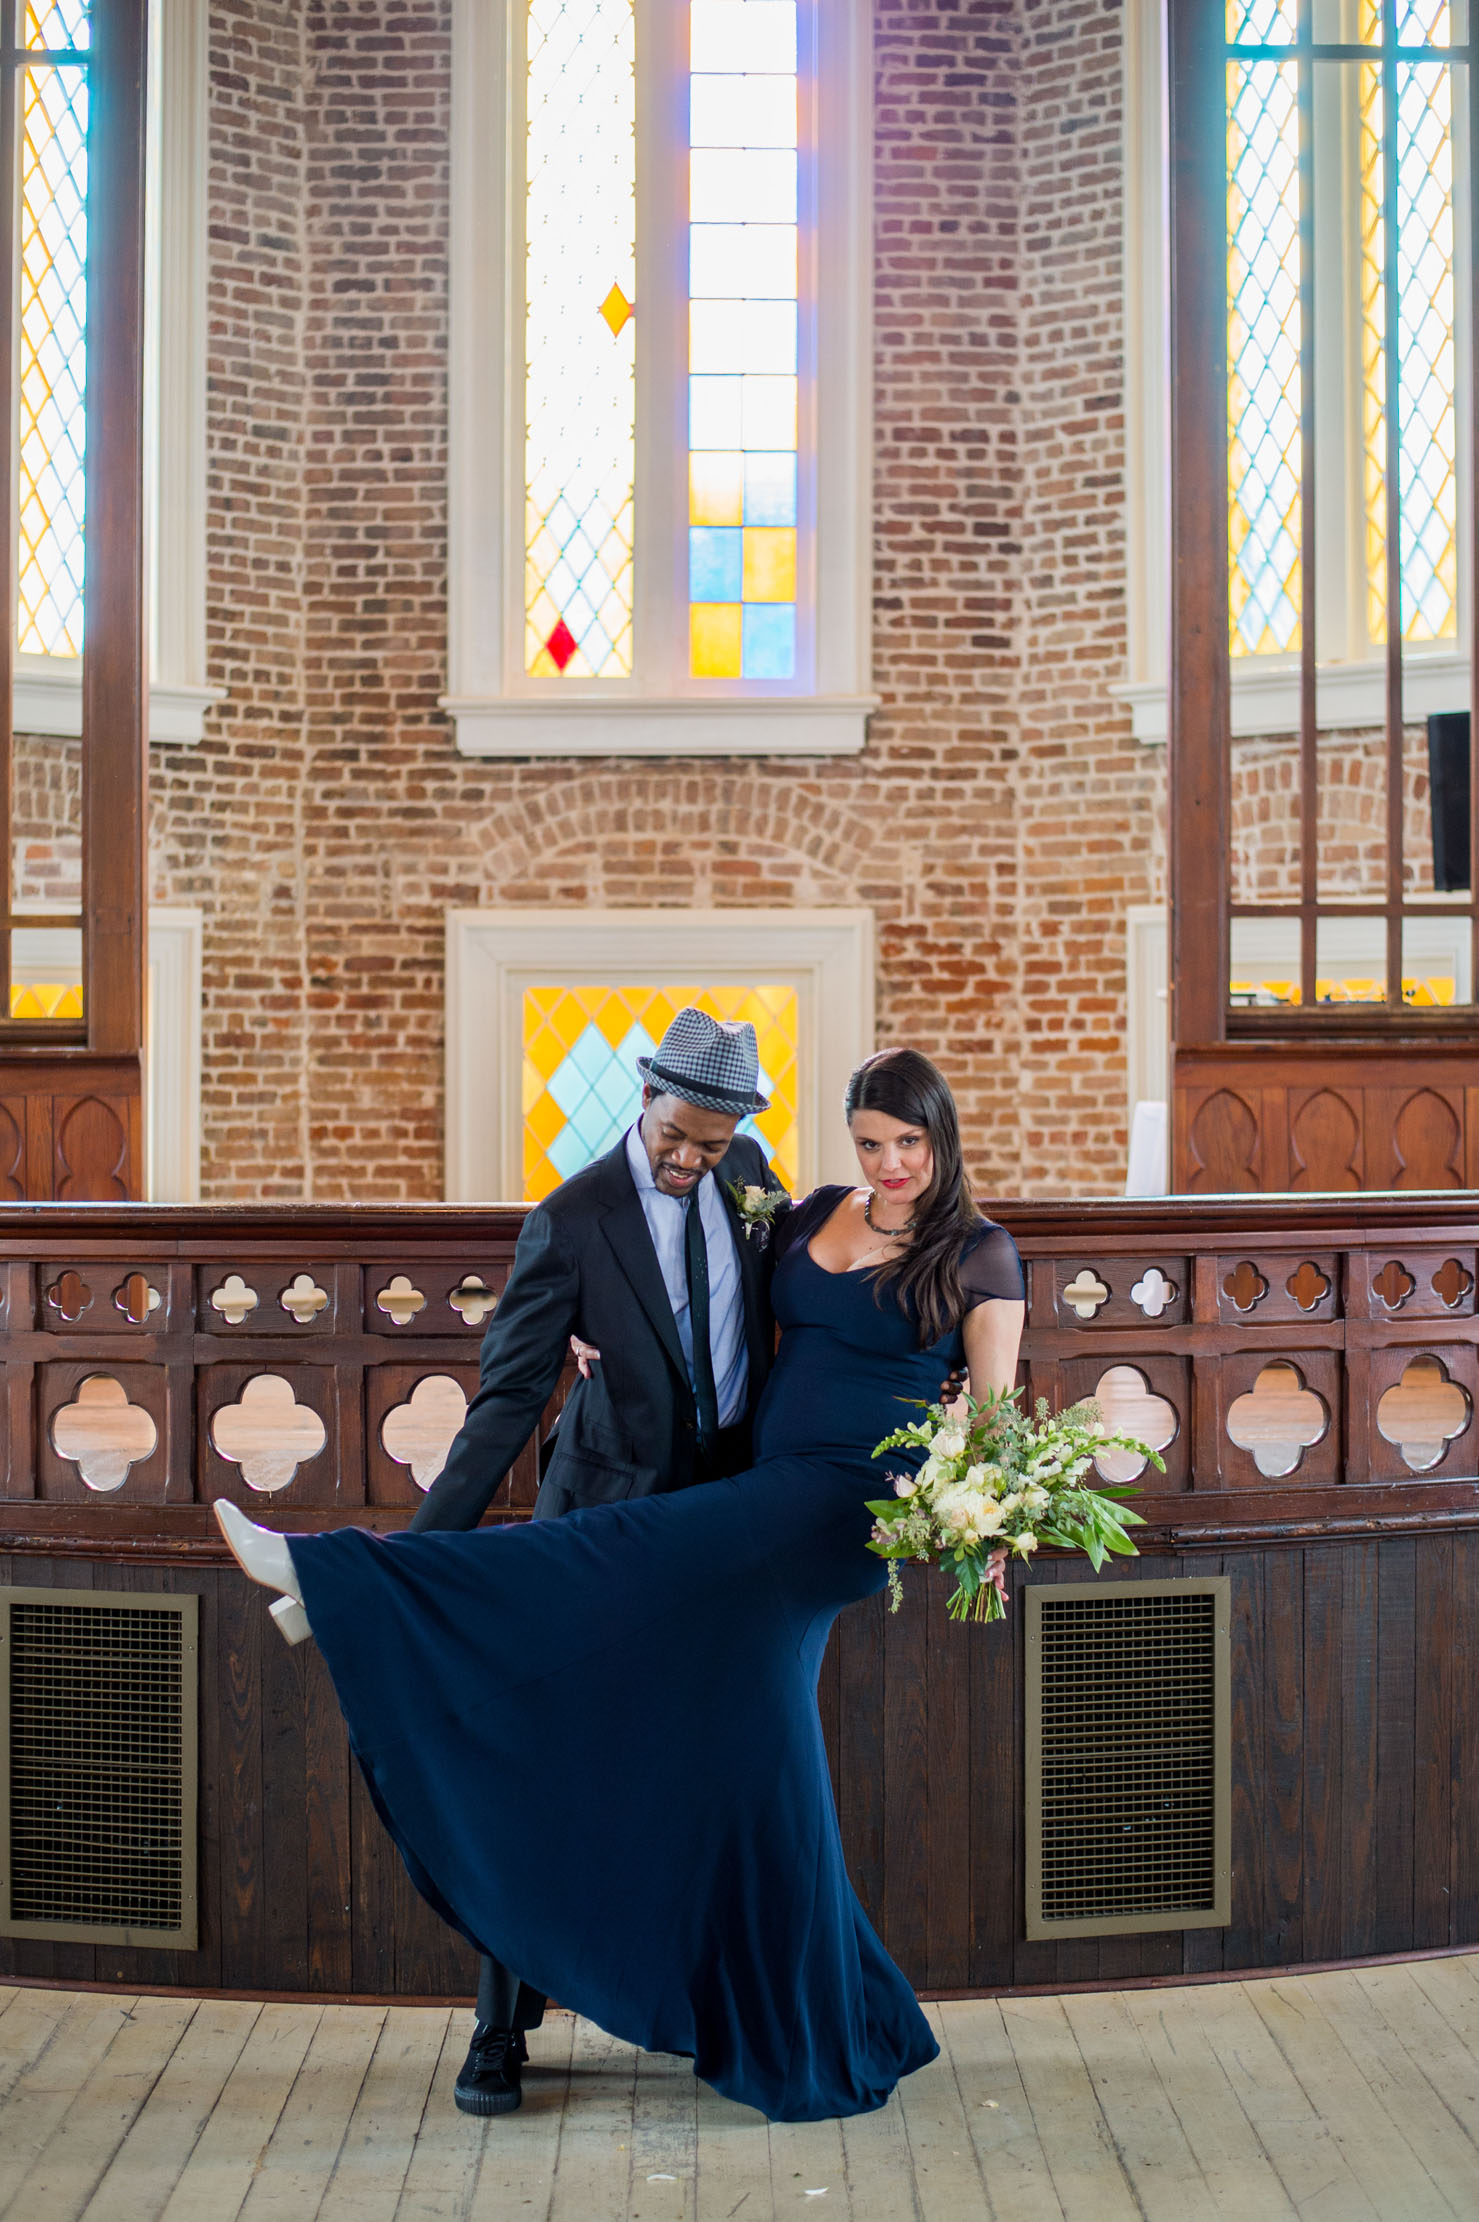 NOLA-Felicity-Church-Ace-Hotel-Wedding-1036.jpg